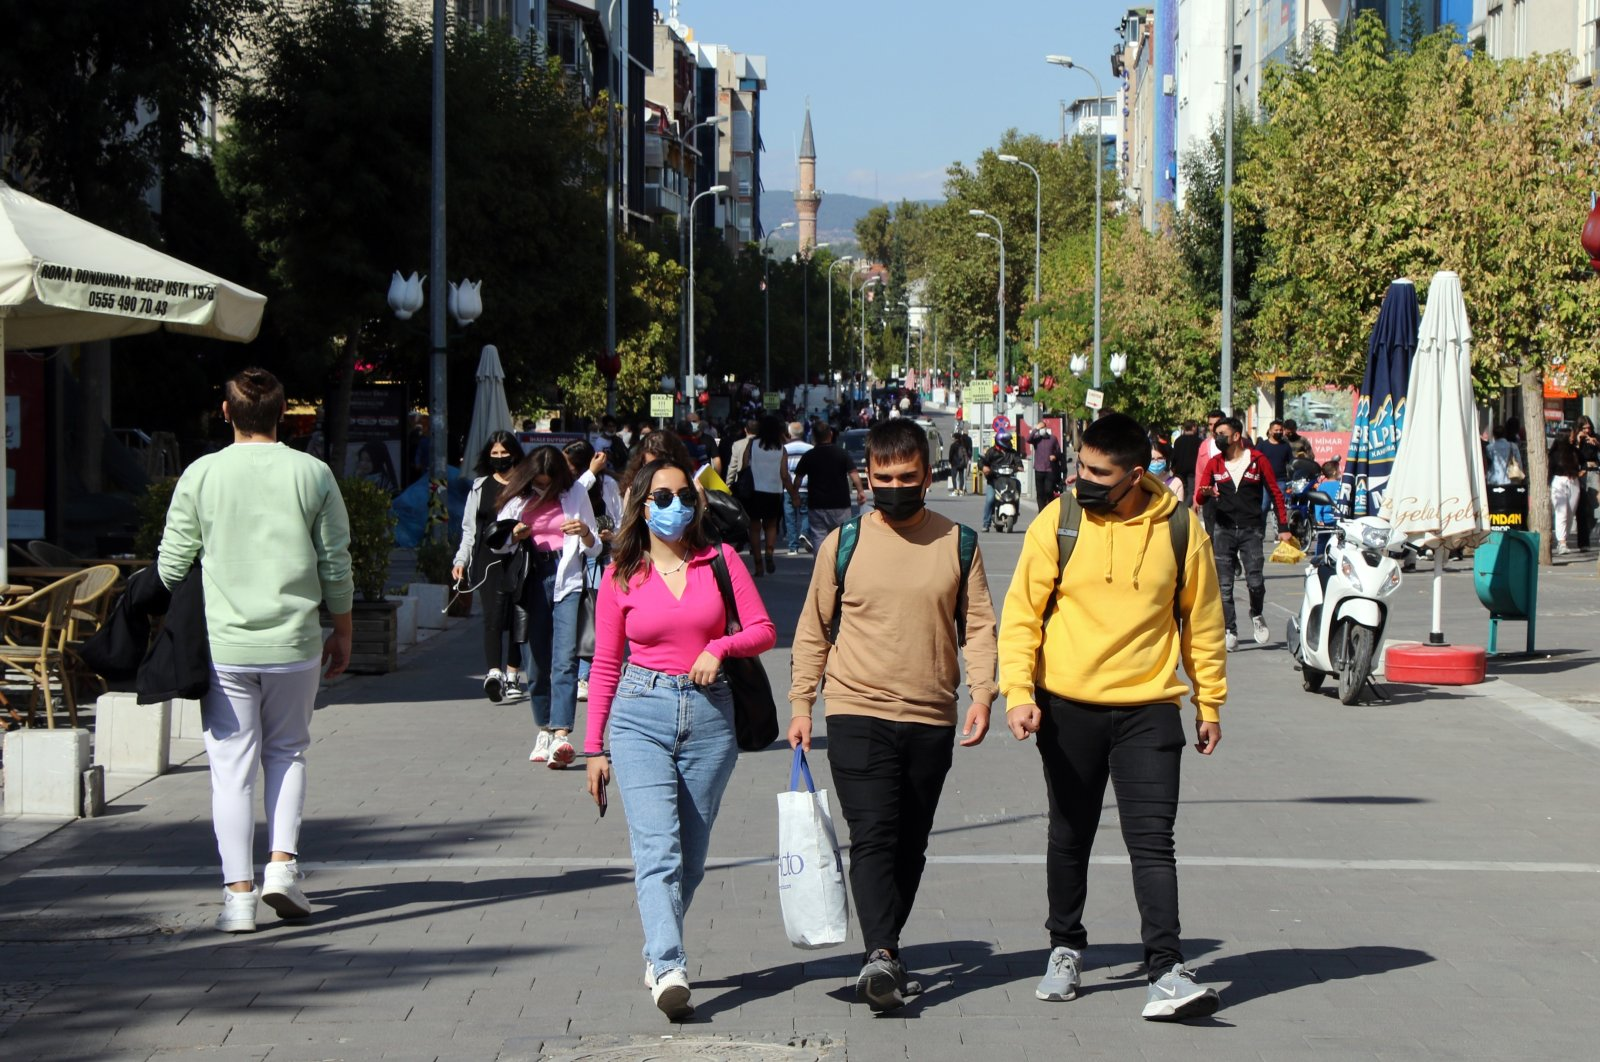 People wearing protective masks against COVID-19 walk on a street in Uşak, western Turkey, Oct. 10, 2021. (AA Photo)